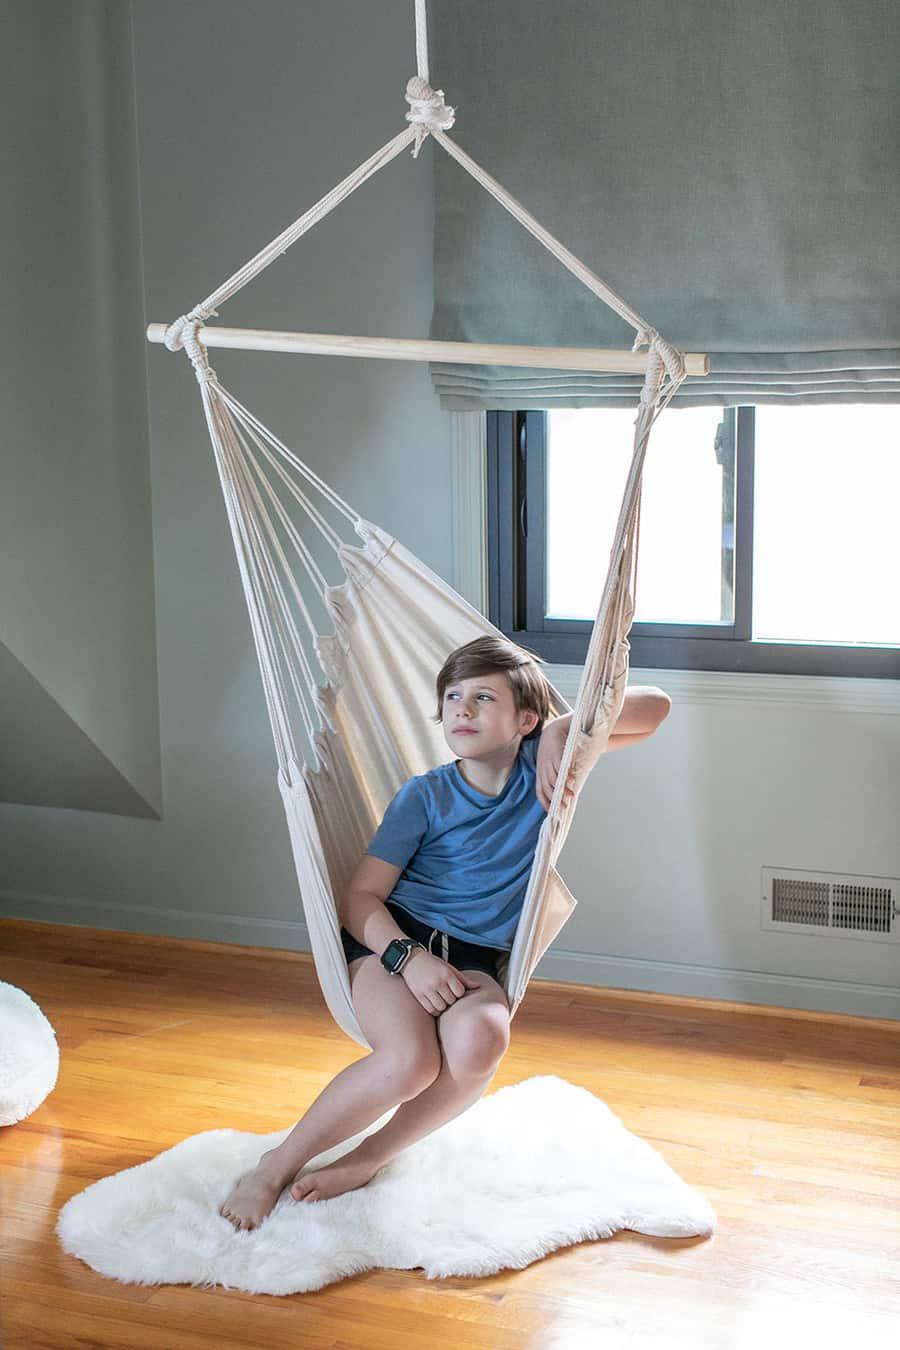 Kids bedroom ideas boy in a hanging chair